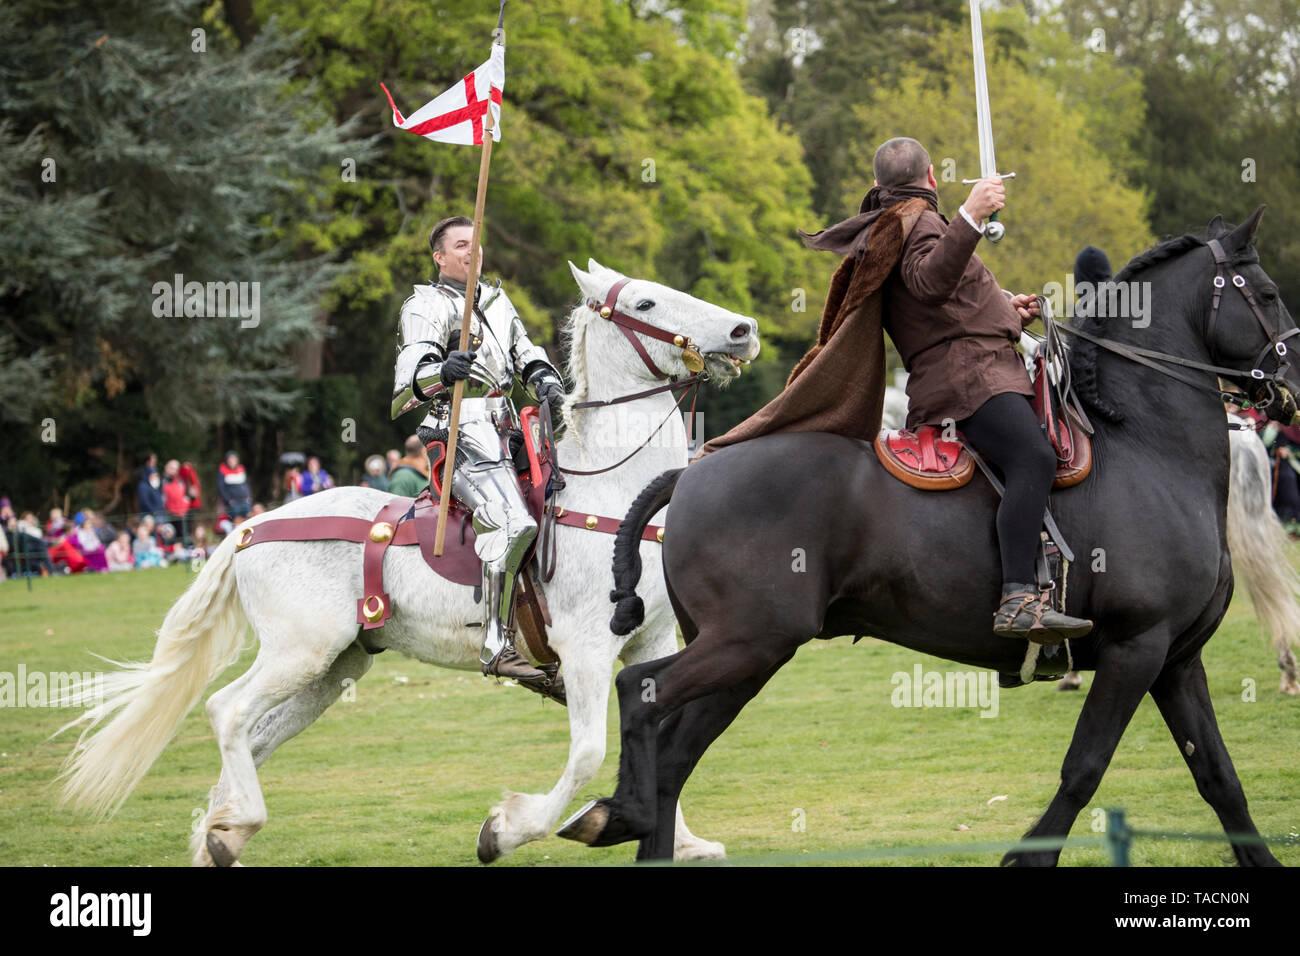 St George's festival  at Wrest Park, Silsoe, Bedfordshire, England - Stock Image